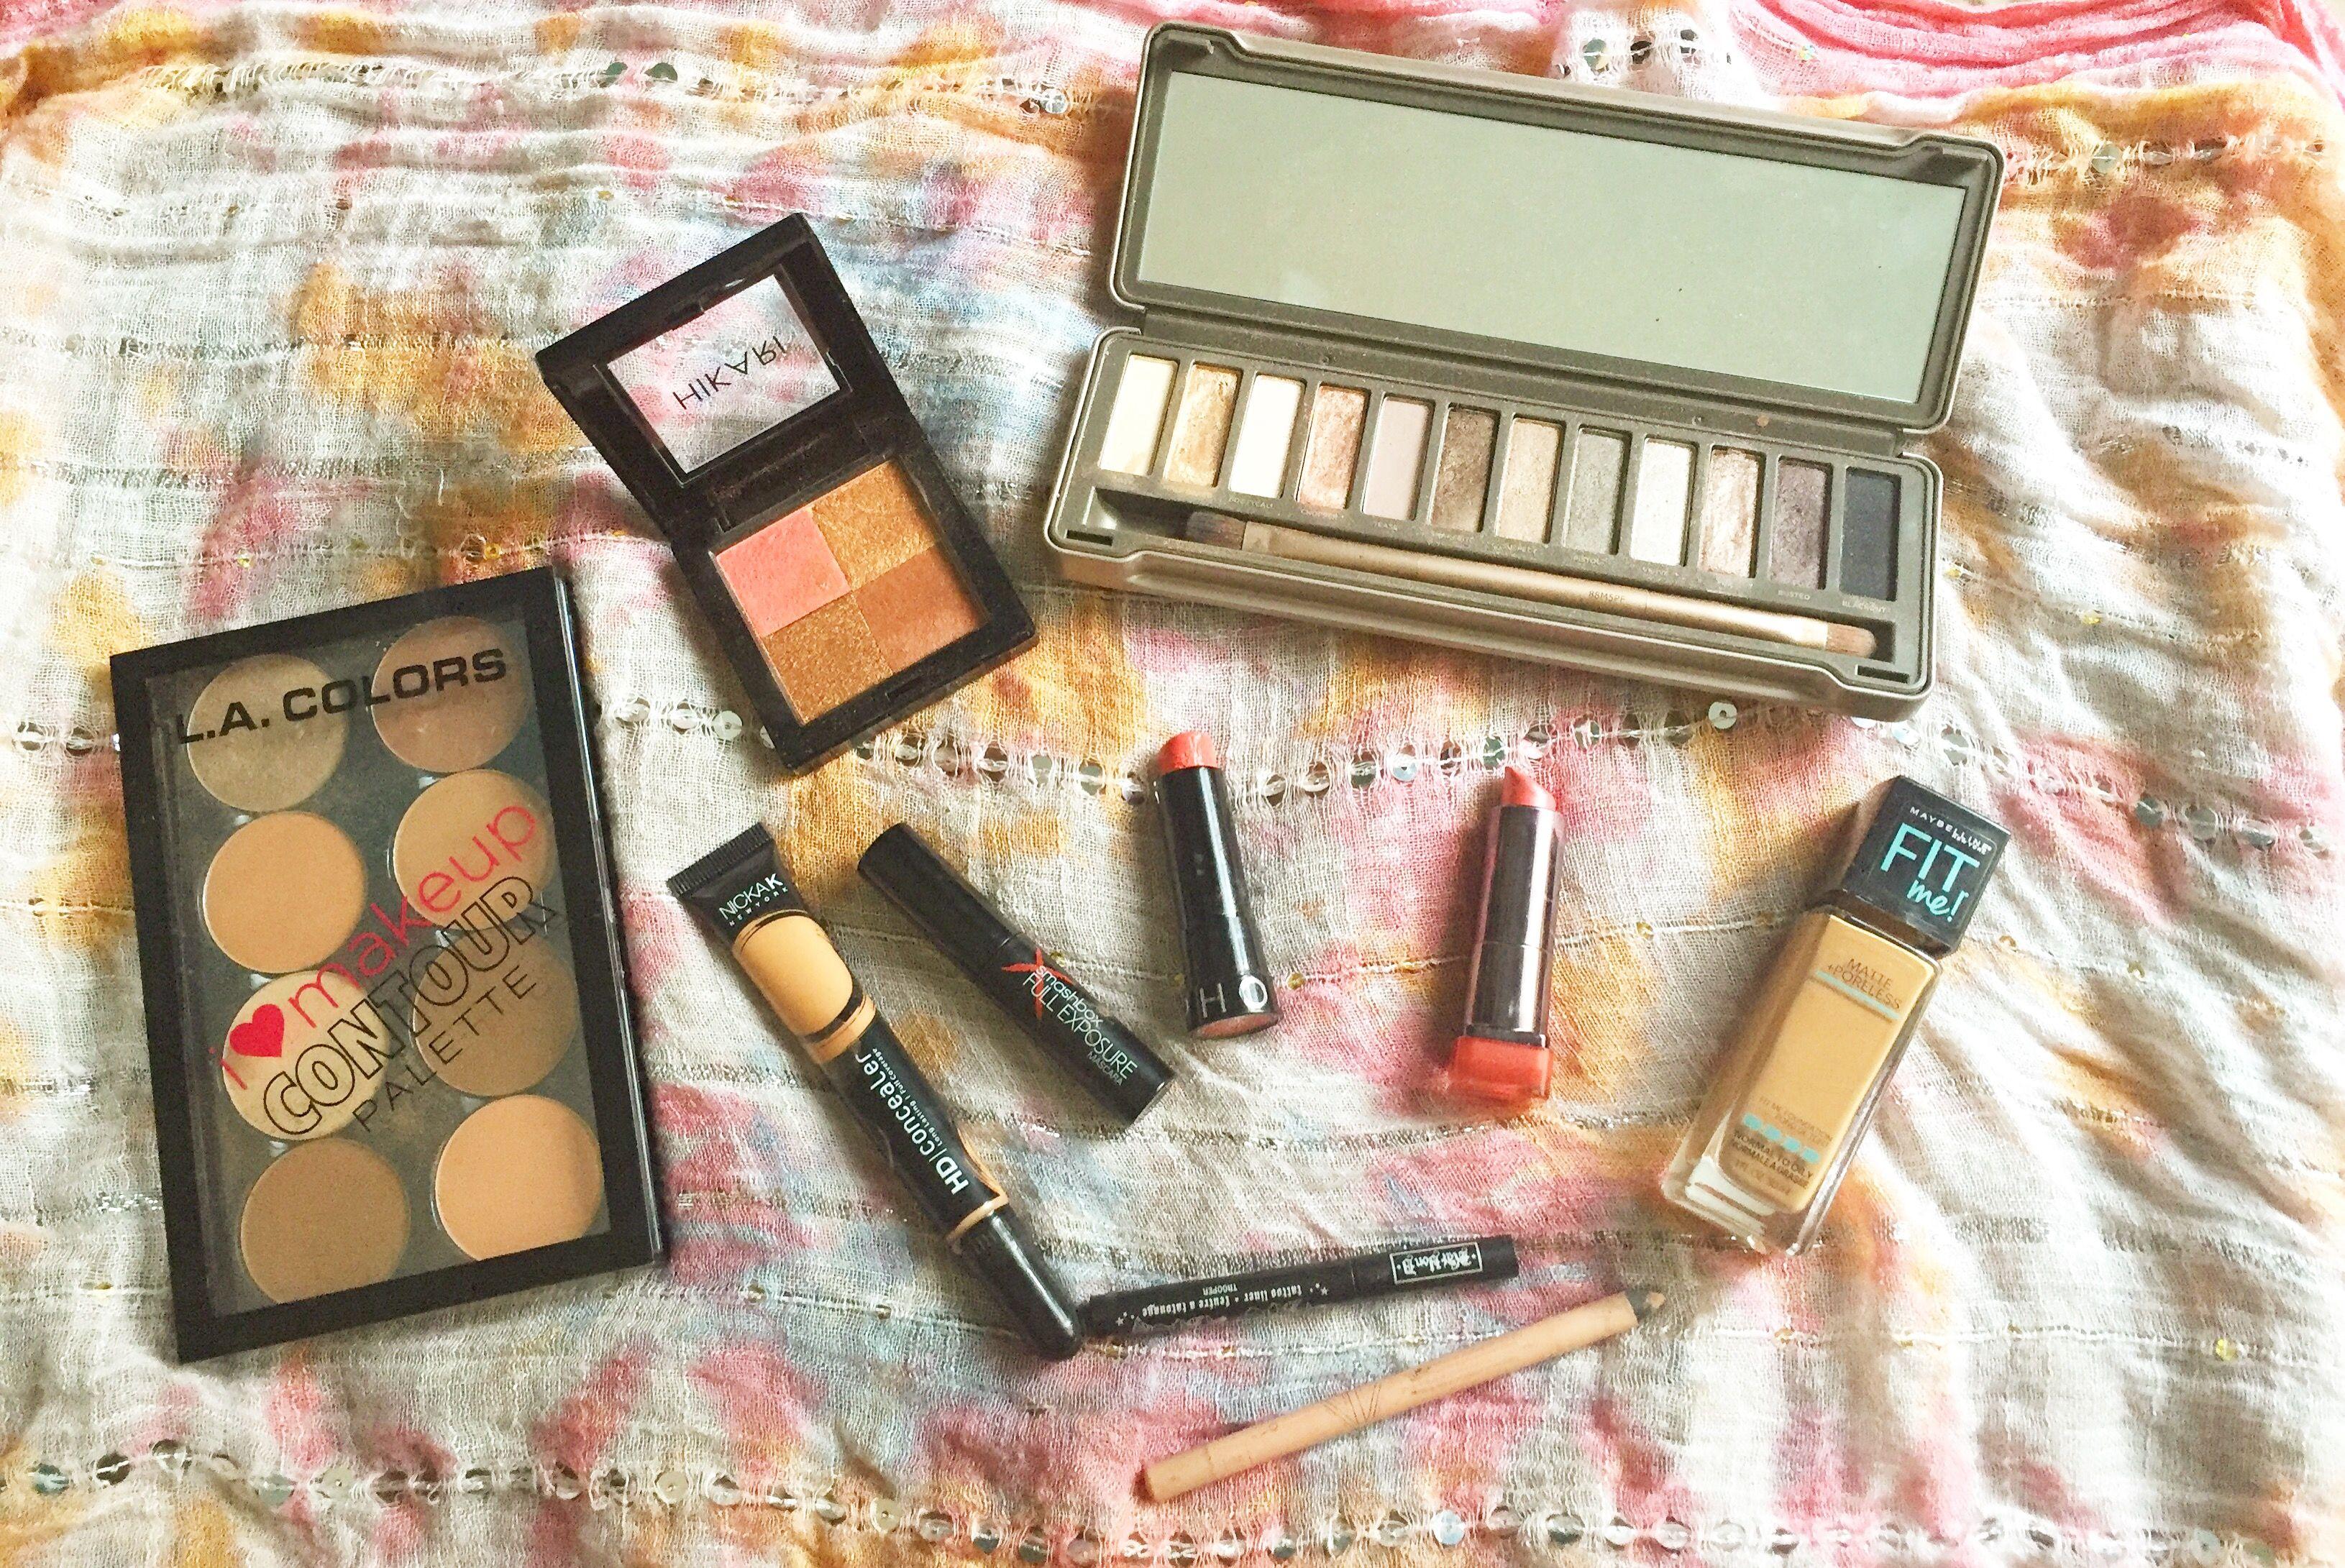 Instagram @pinkathenabeauty  #beautyguru #bbloggers #instablog #makeupblog #beautycommunity #makeupjunkie #beautyjunkie  #latinablogger #eyeshadow #cosmetic #lipstick #beauty #lips #palettes #beautiful #beautyblogger #beautyblog #beautyjunkie #instamakeup #flatlay #makeup #makeupfanatic #flatlayoftheday #instalike #afrolatina #ilovemakeup